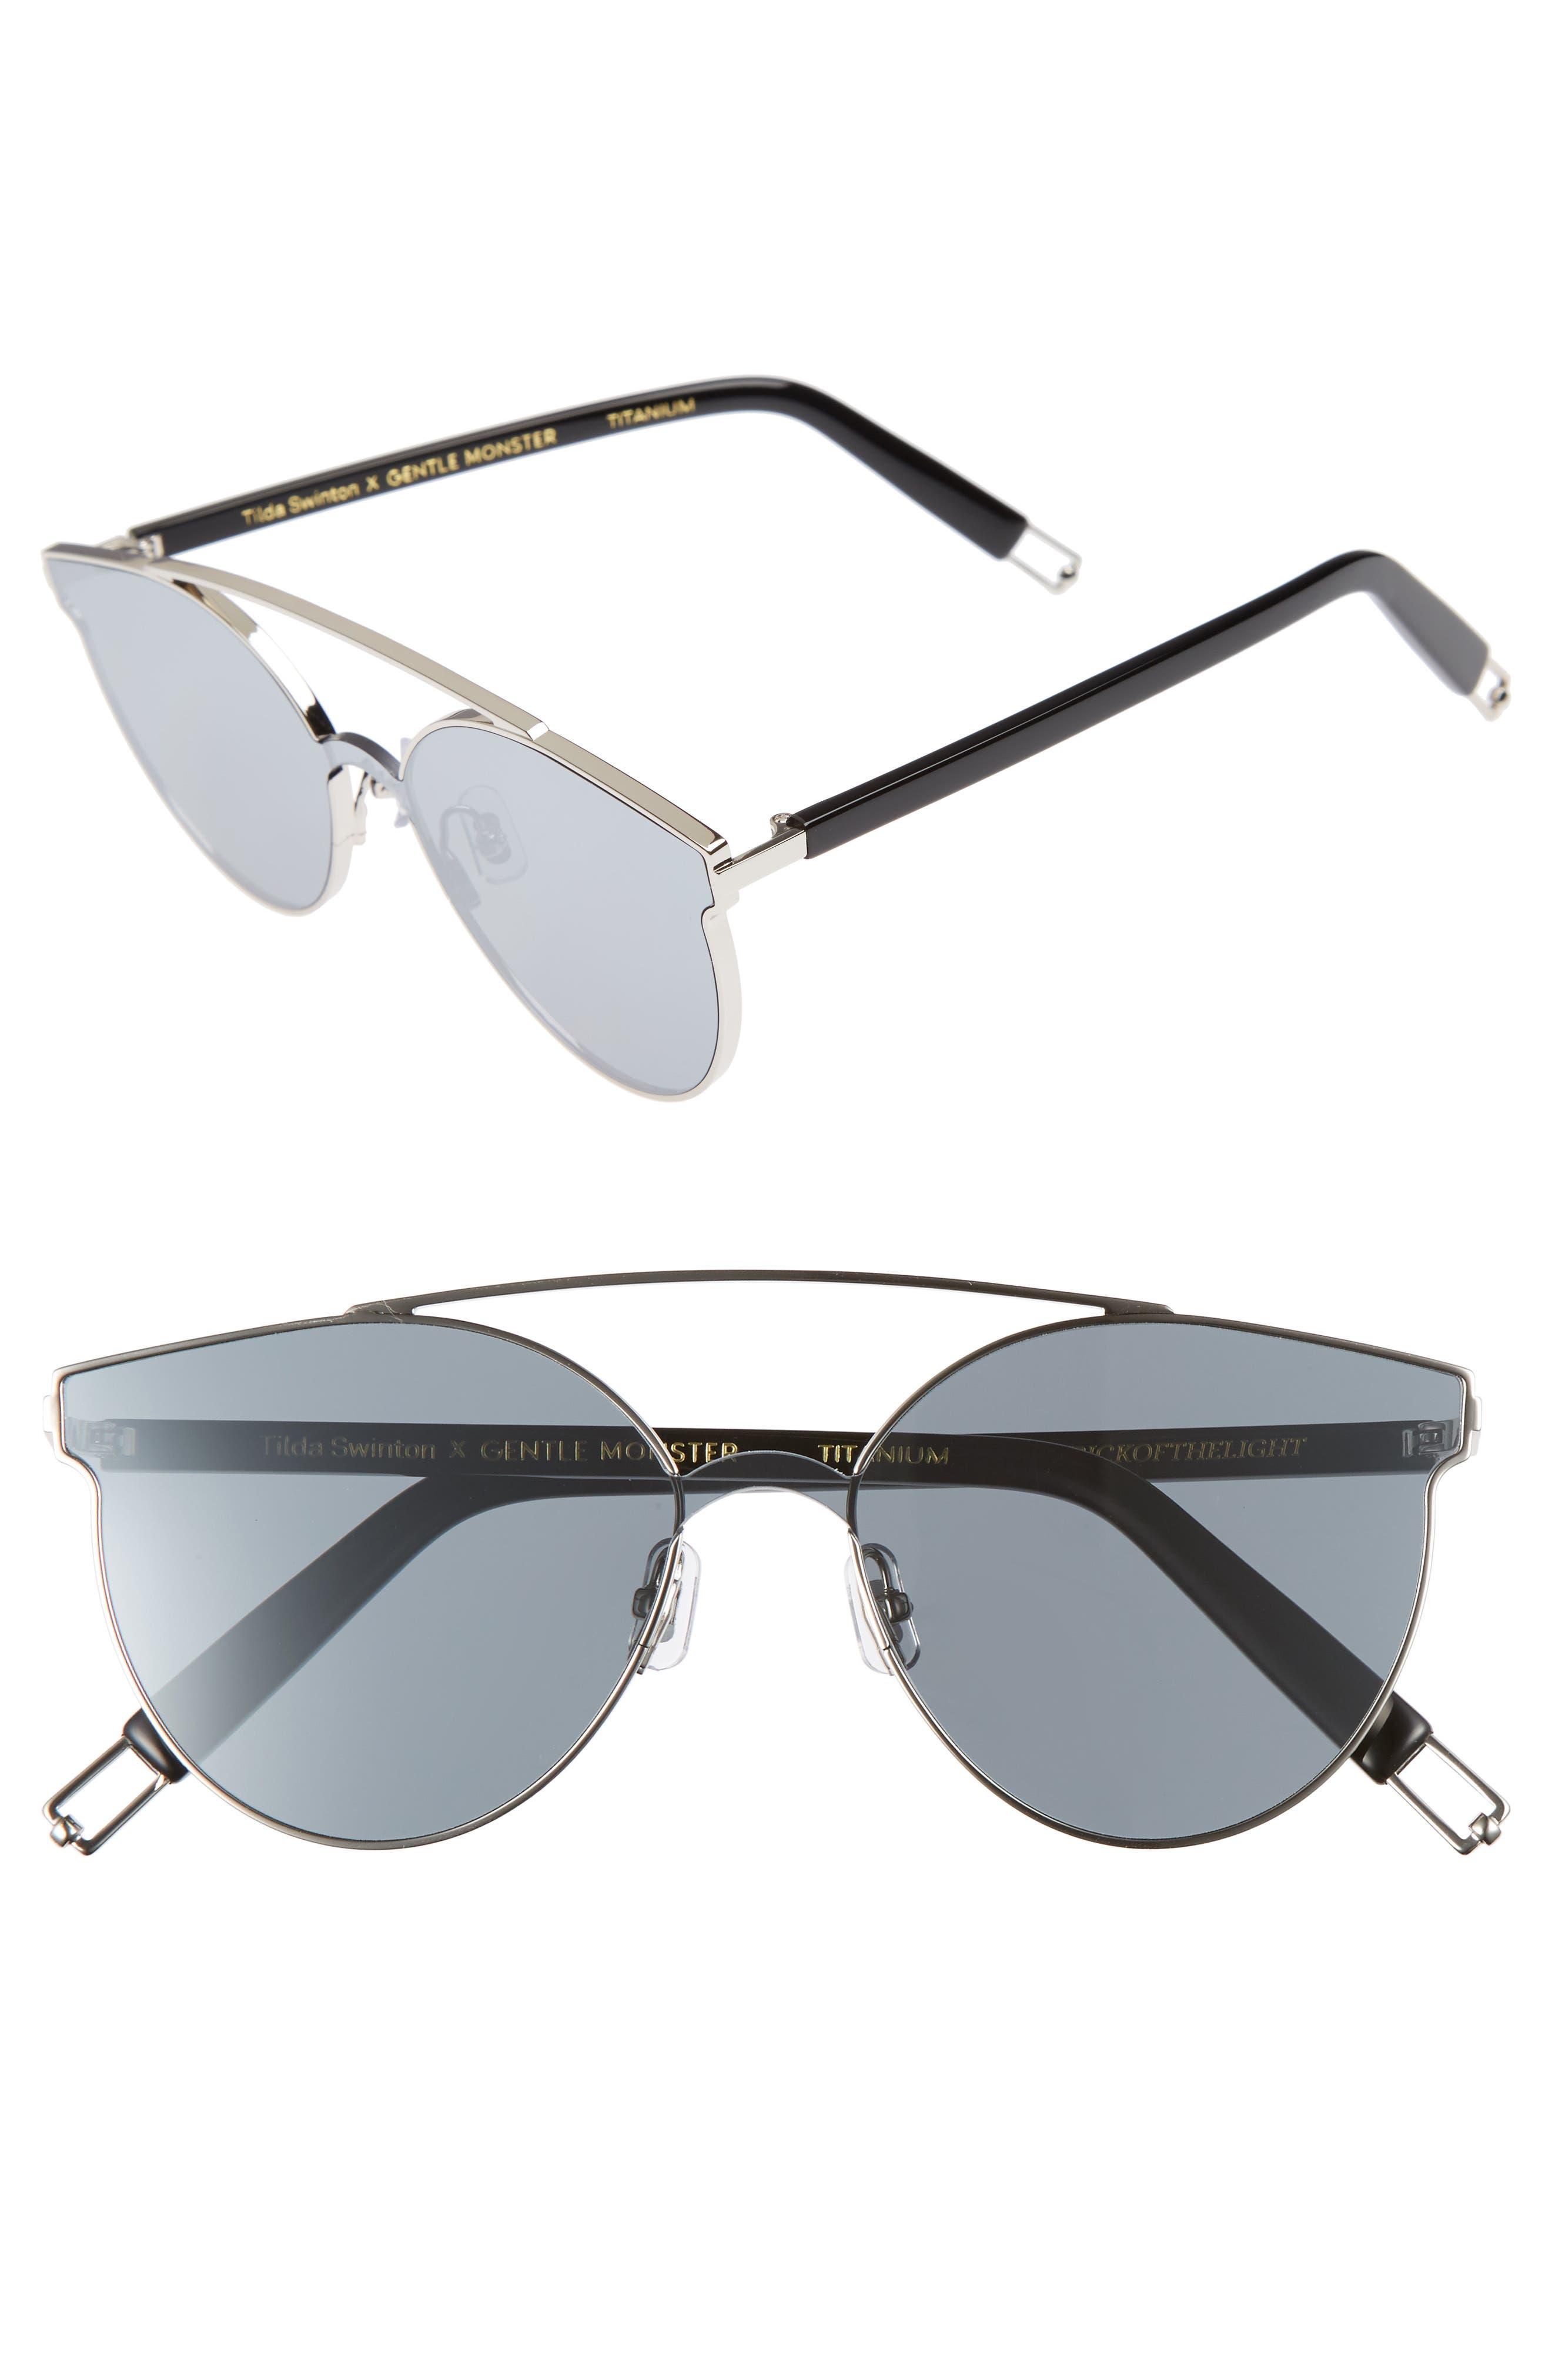 Tilda Swinton x Gentle Monster Trick of the Light 60mm Shield Sunglasses,                         Main,                         color, 040